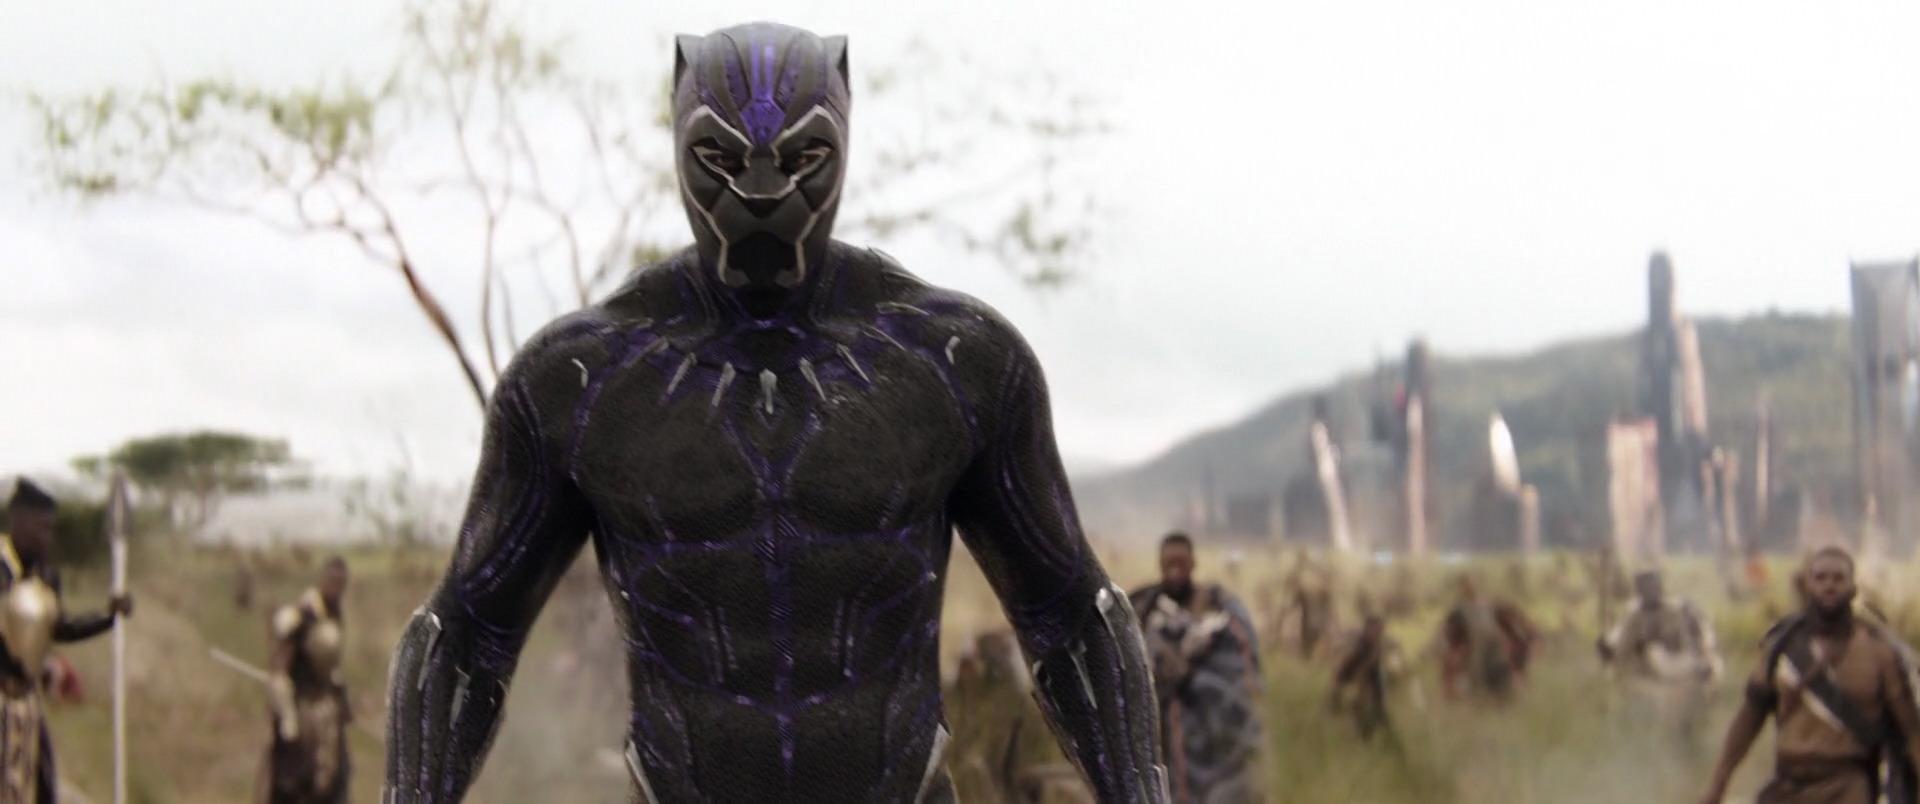 Curiosità su Chadwick Boseman Infinity War Screencaps